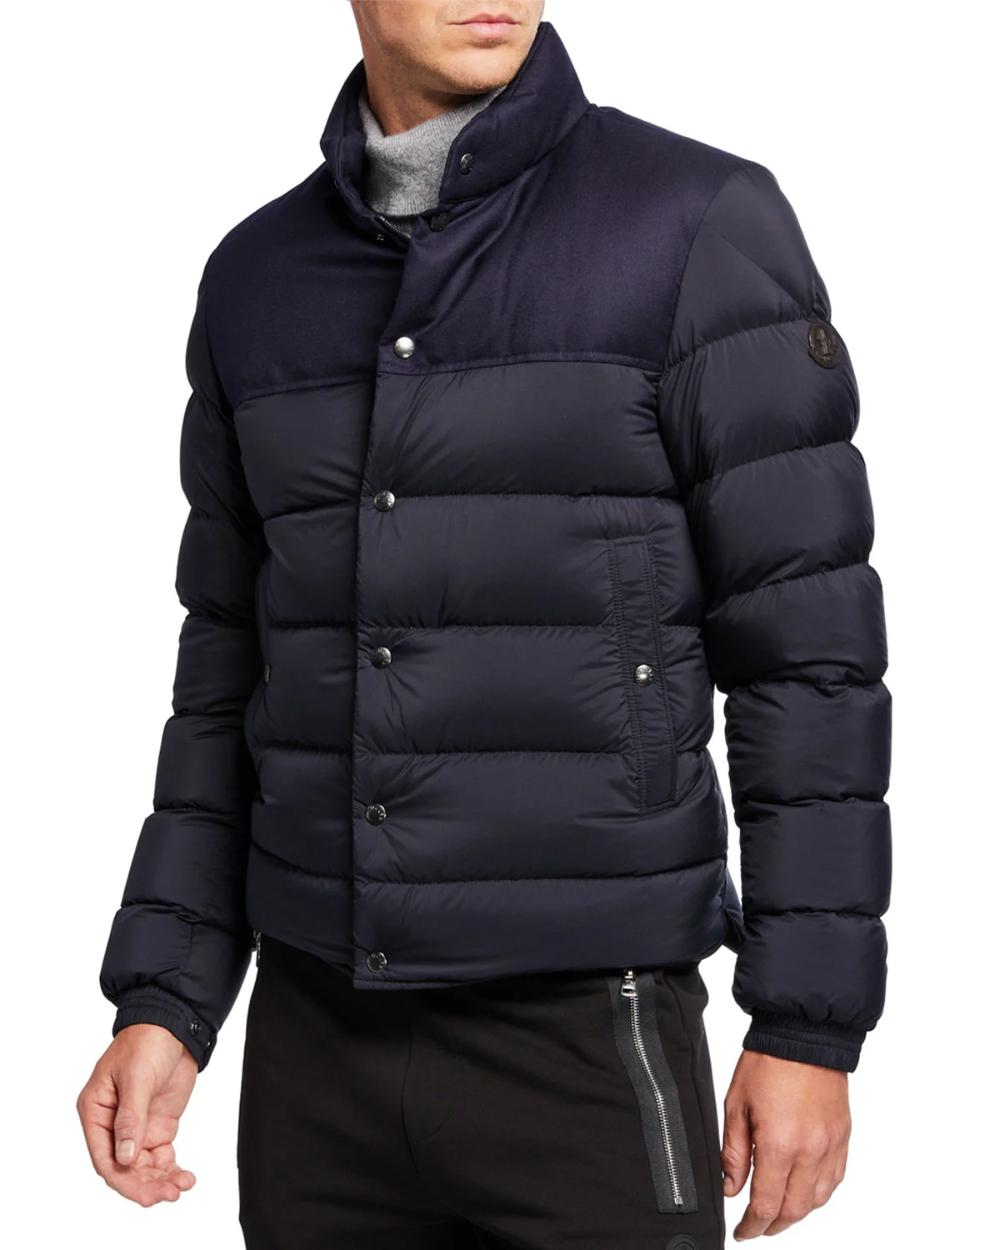 Moncler Men S Rousseau Puffer Jacket Puffer Jackets Jackets Moncler [ 1250 x 1000 Pixel ]